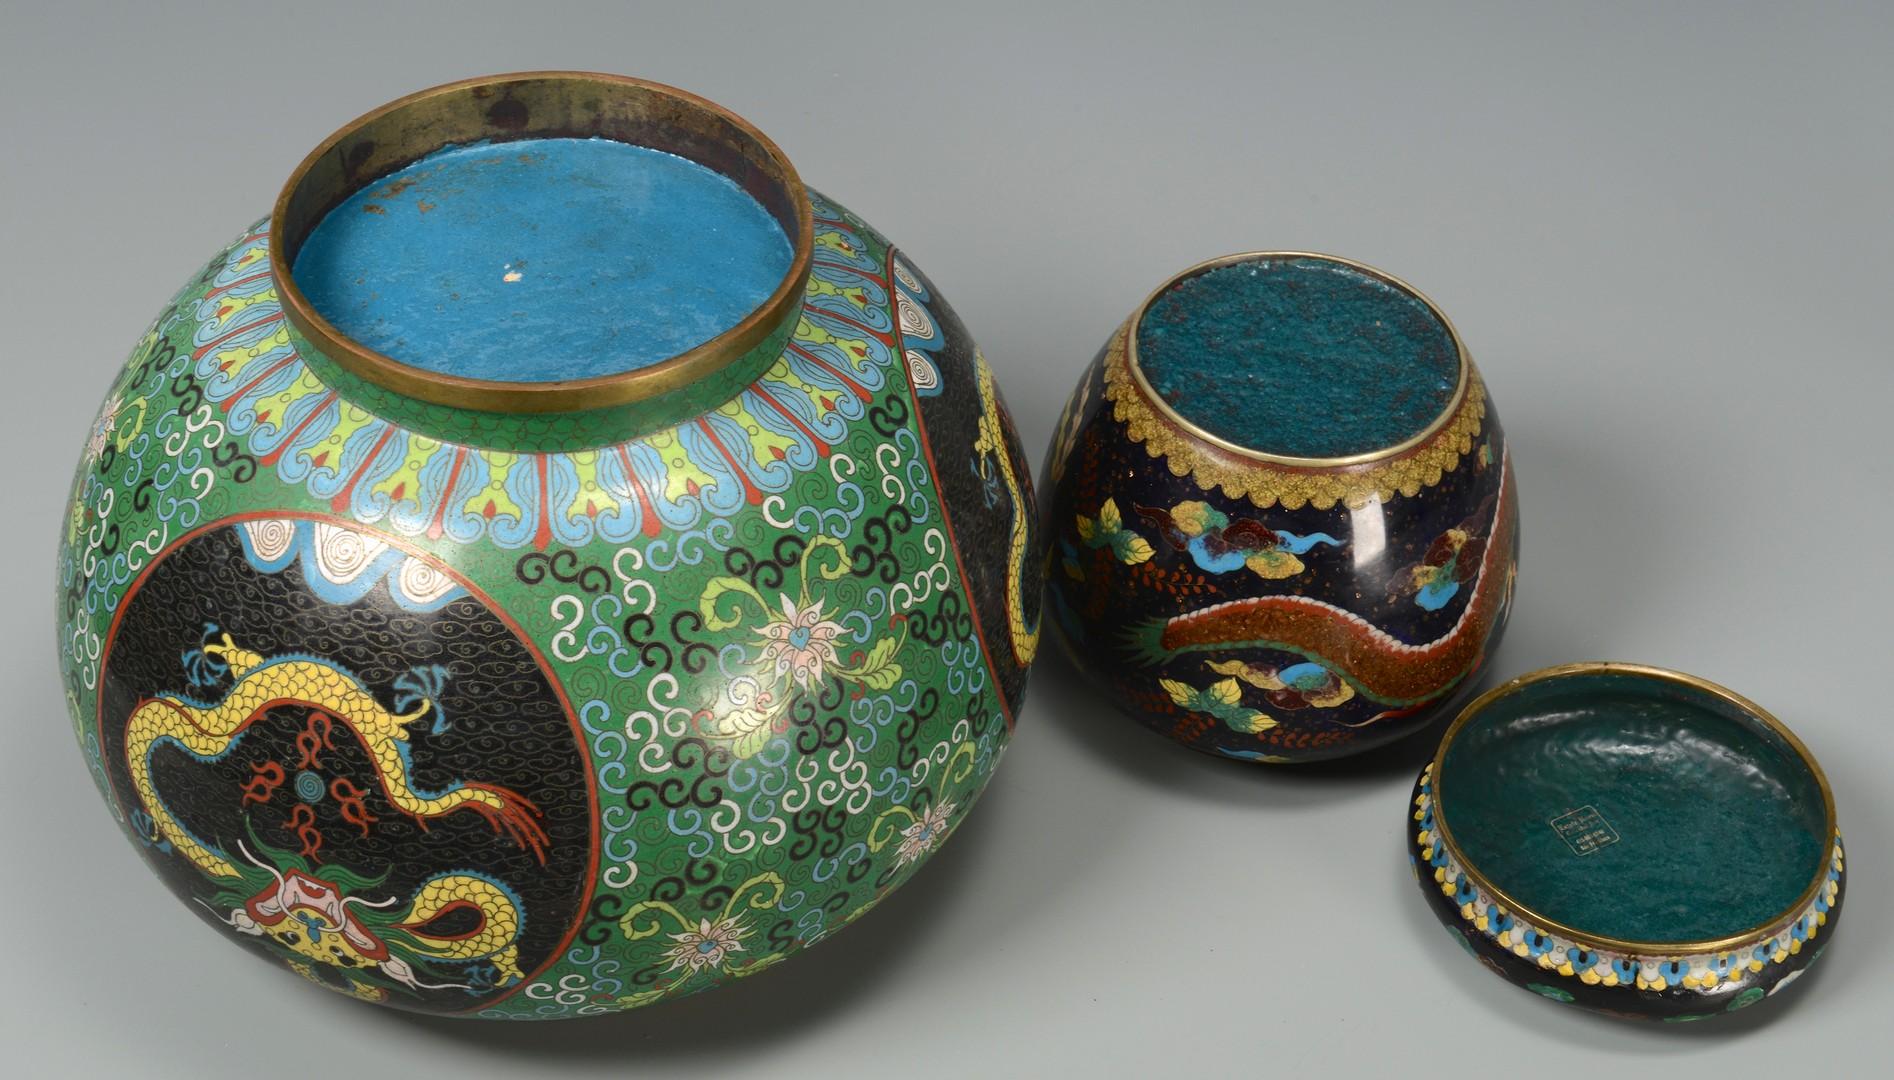 Lot 3594200: 2 Cloisonne Storage Jars